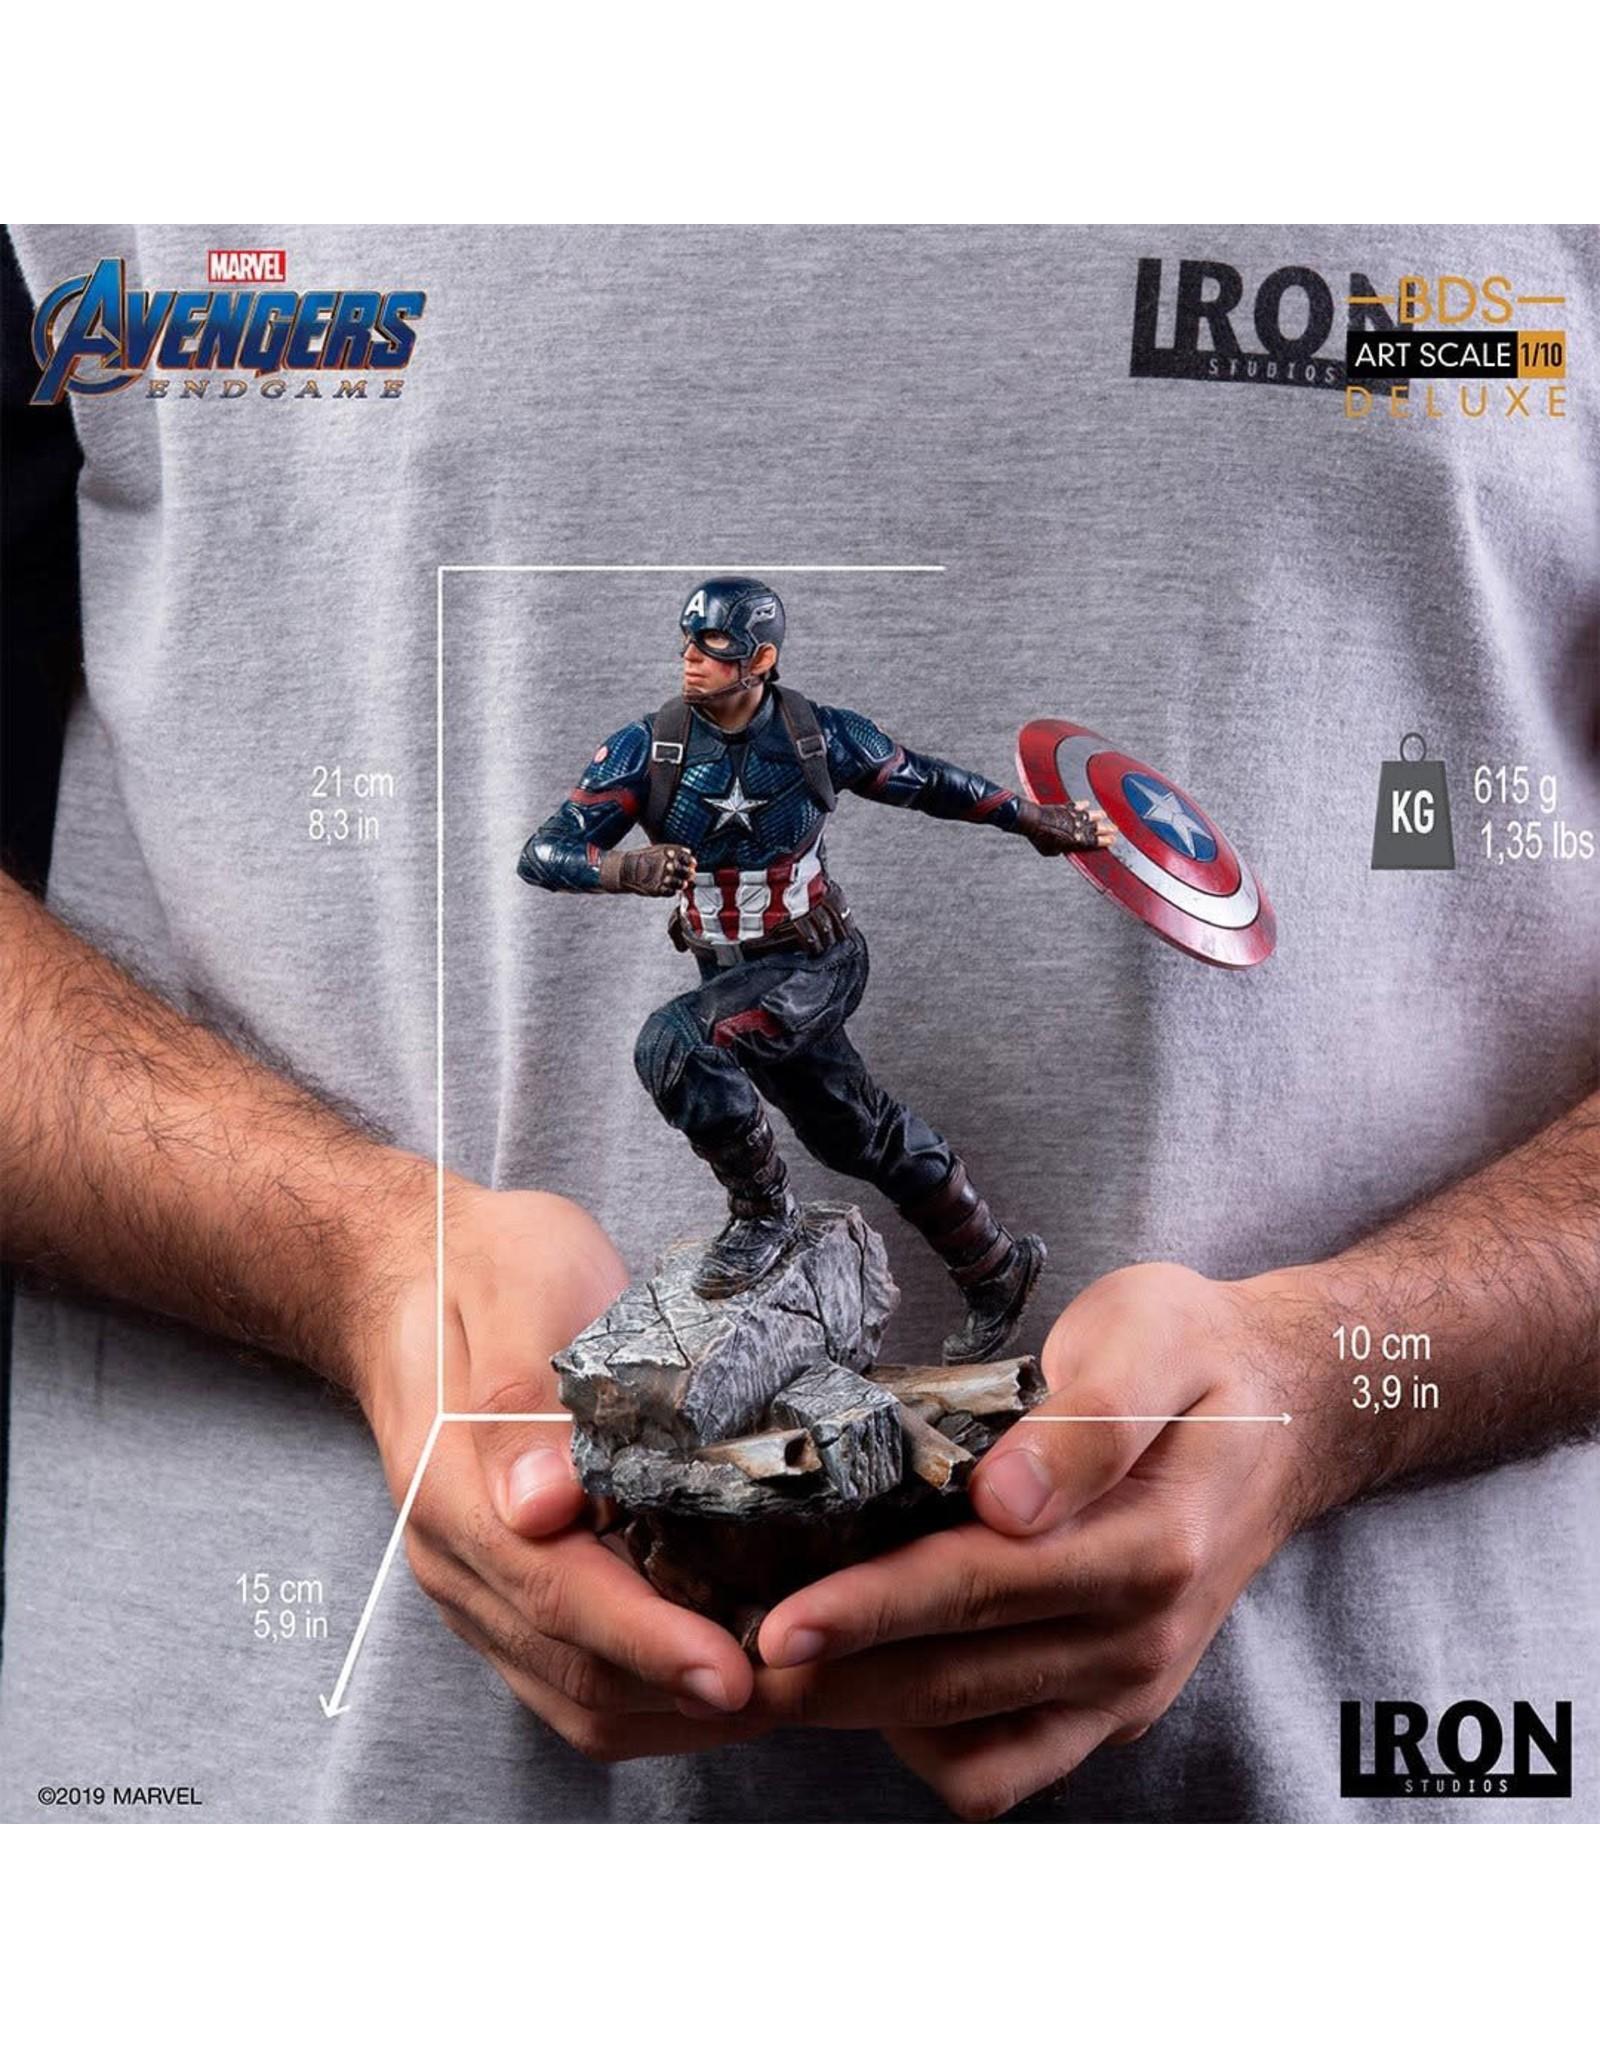 Iron Studios AVENGERS ENDGAME Deluxe Version Statue 21cm - Captain America